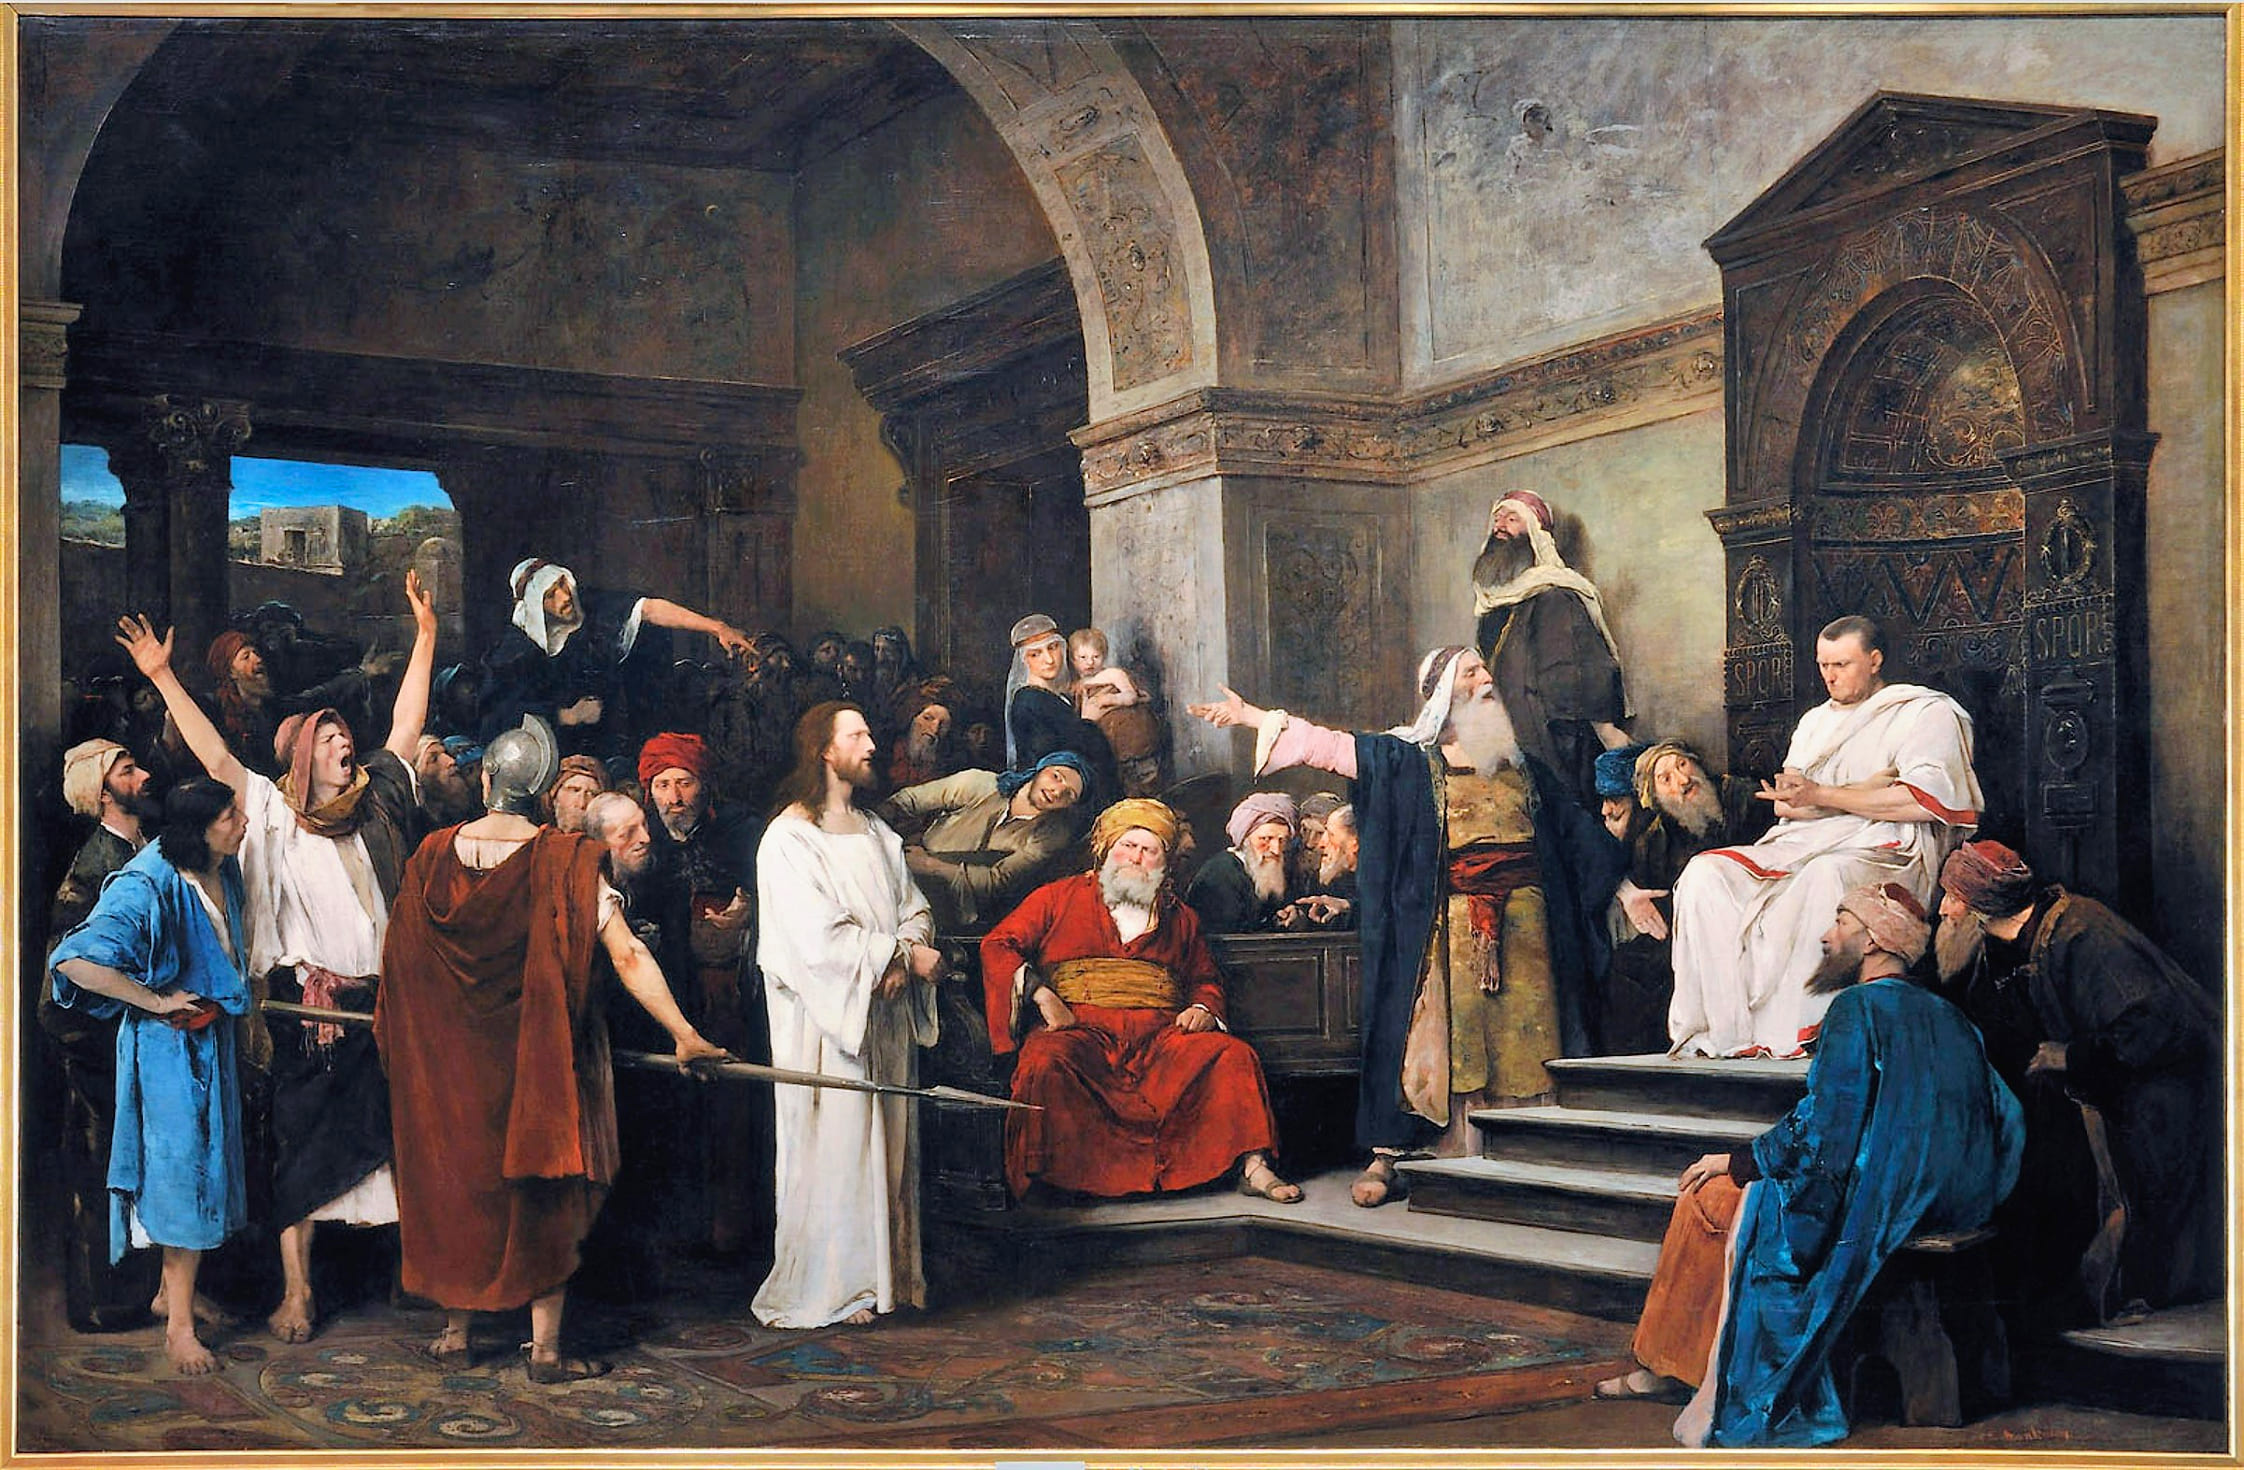 Christ Pilate soldats blanc rouge bleu salle  trône marches procès Mihály Munkácsy